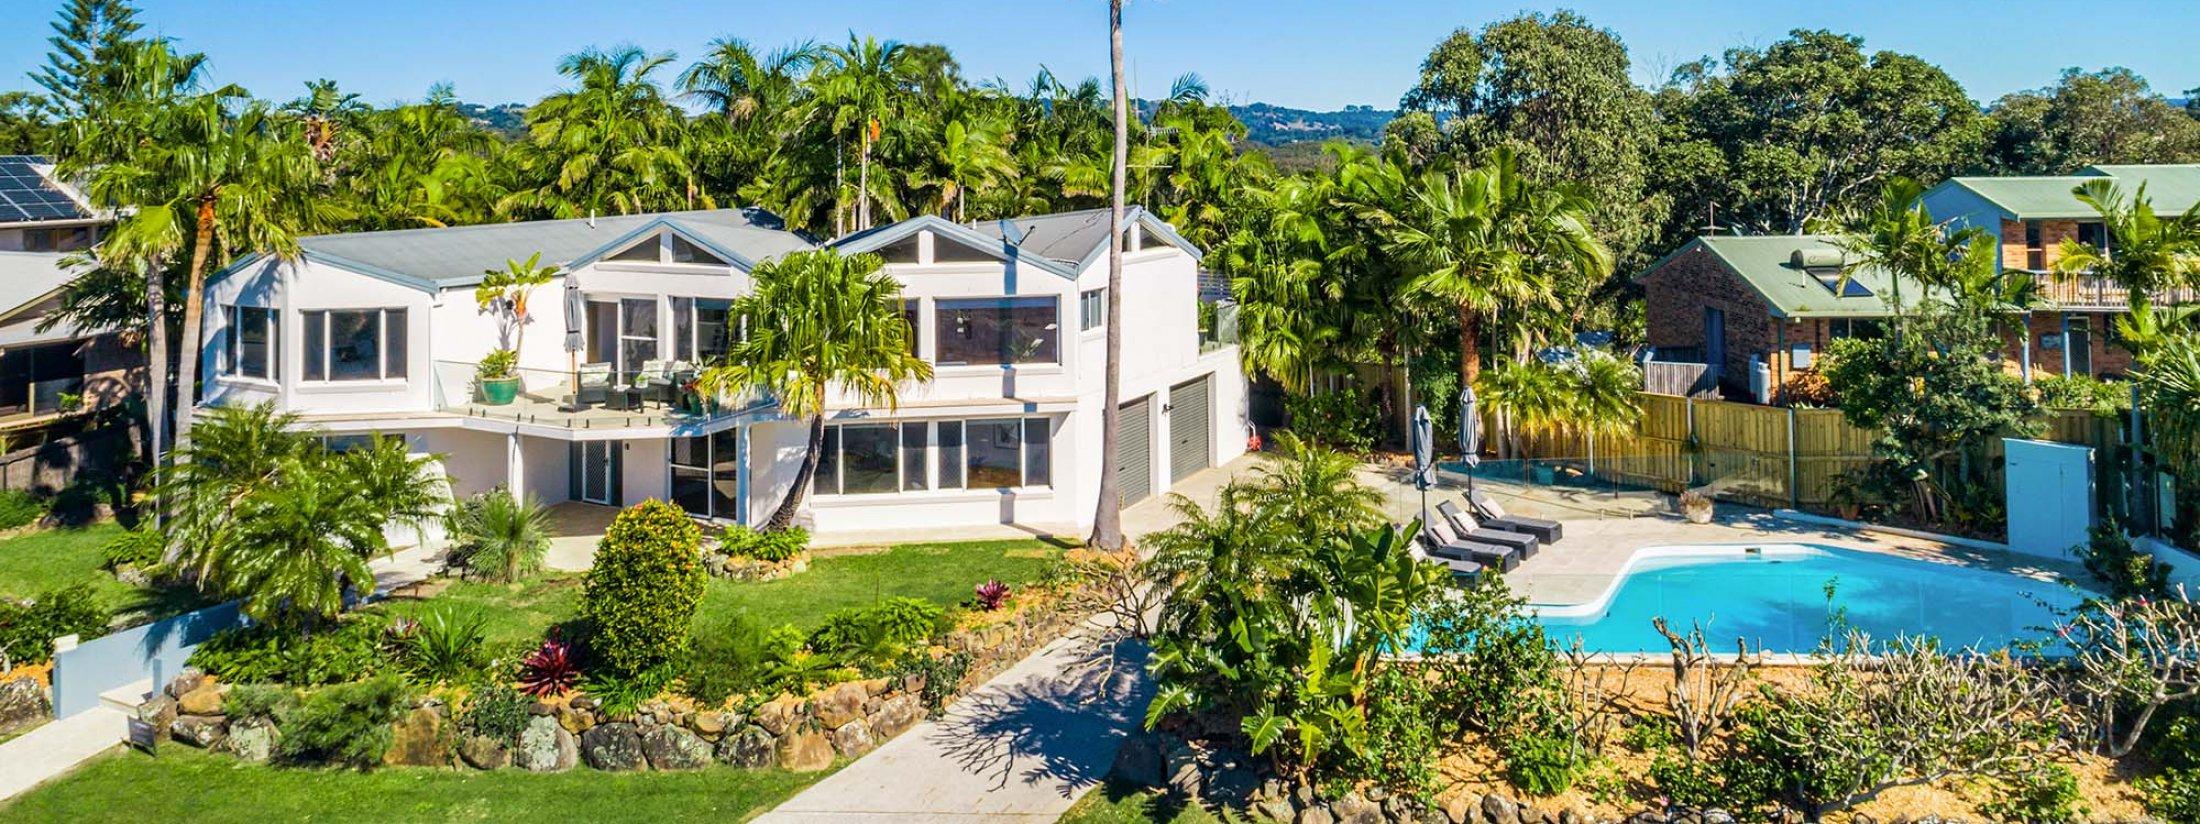 Byron Pacific Vista - Byron Bay - Aerial towards House